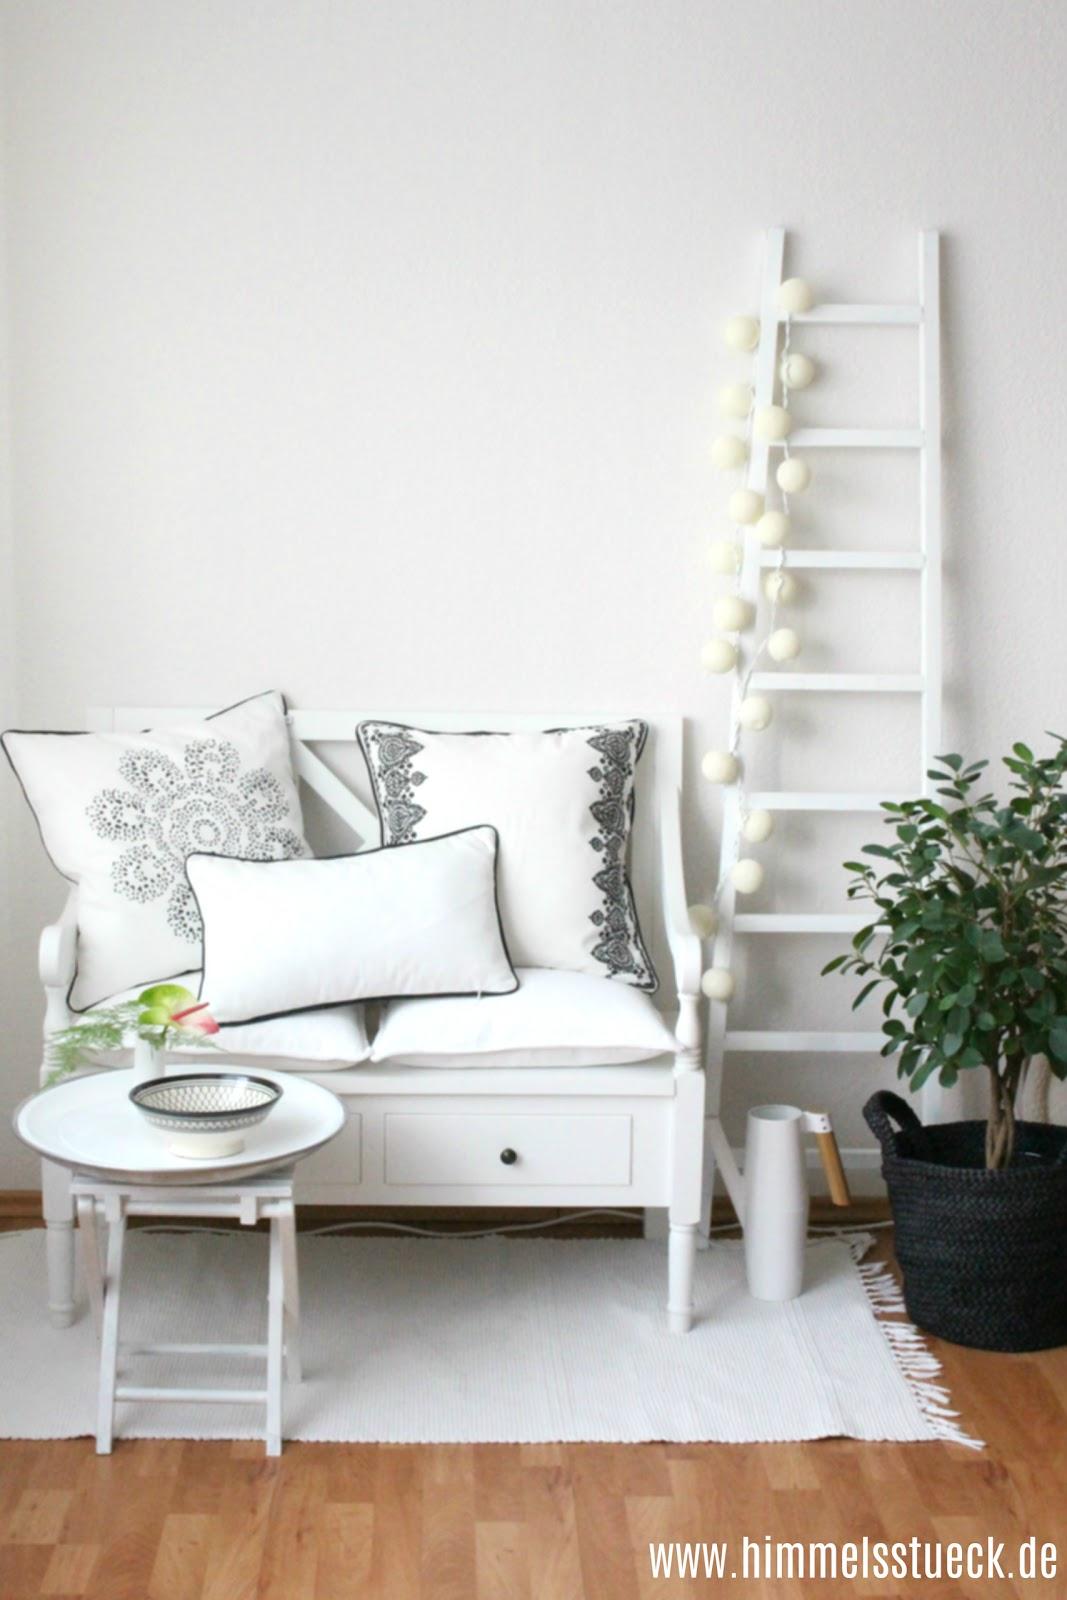 himmelsst ck interior und lifestyle blog interior wohnk che im sp tsommer. Black Bedroom Furniture Sets. Home Design Ideas